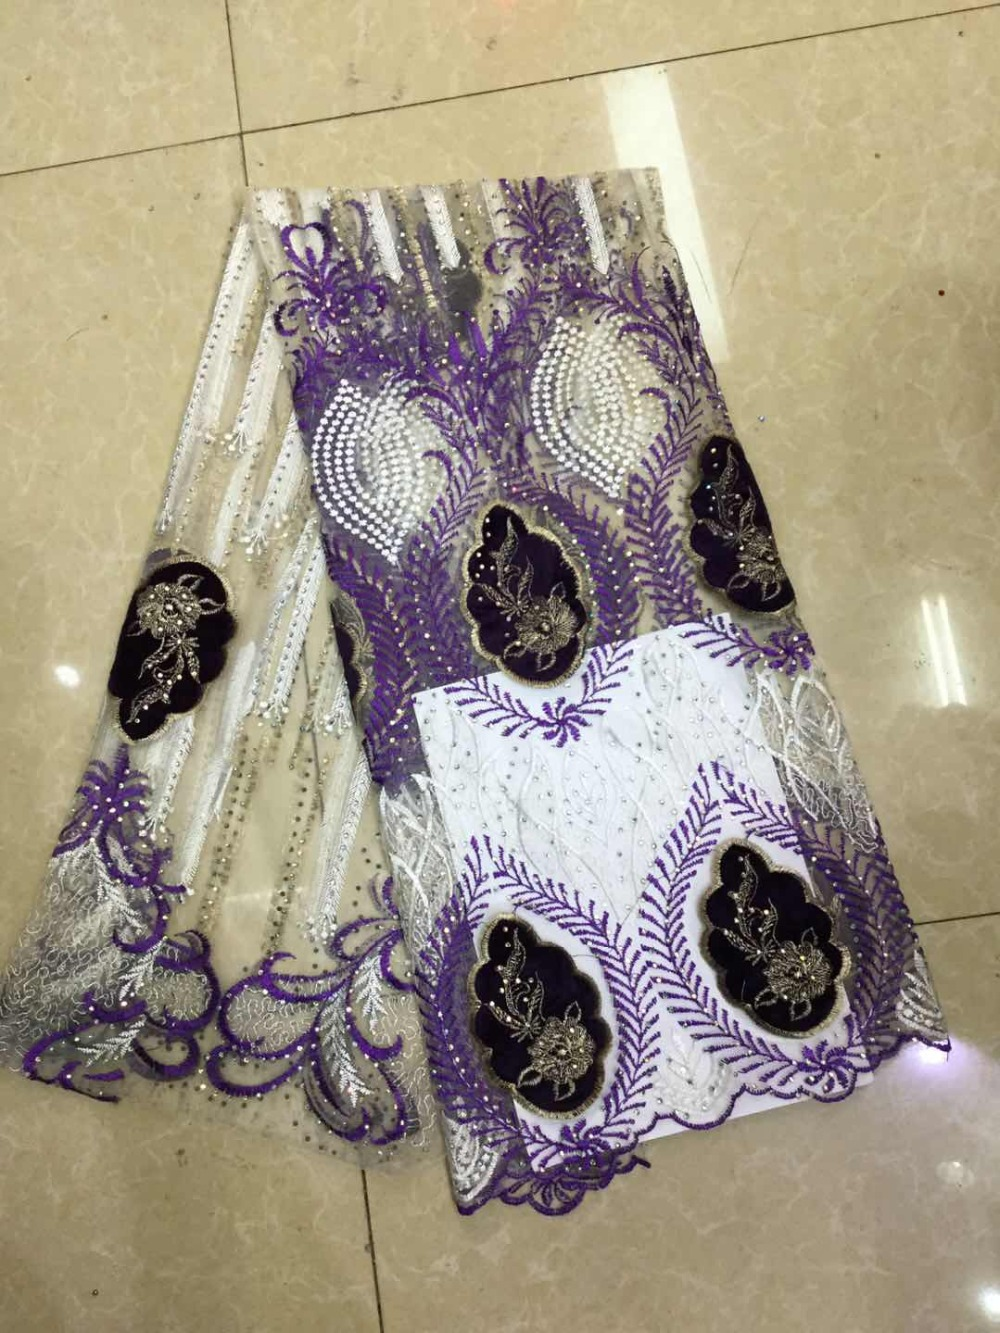 New African chiffon lace fabric high quality lace embroidery Nigerian French Guipure chiffon lace fabric womens wearNew African chiffon lace fabric high quality lace embroidery Nigerian French Guipure chiffon lace fabric womens wear